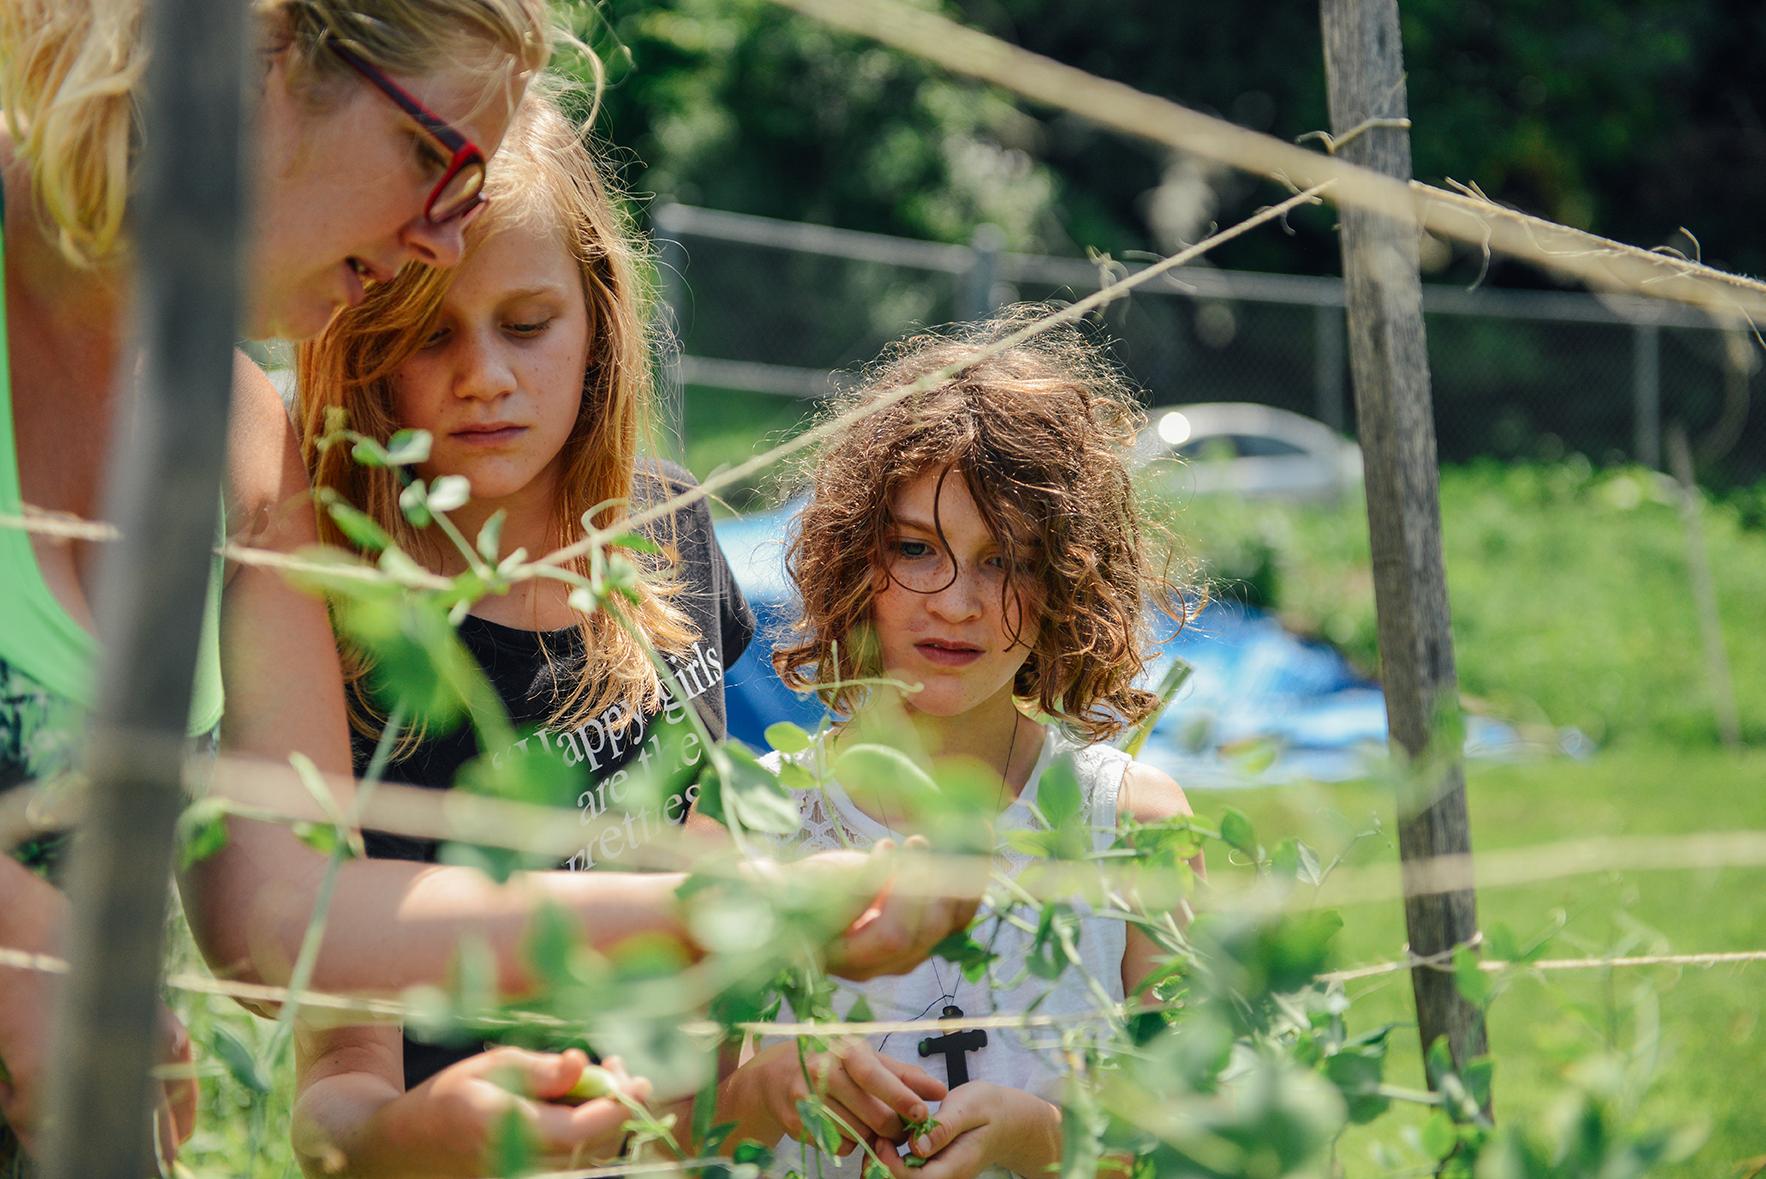 Hazelwood YMCA Garden by Quelcy 08